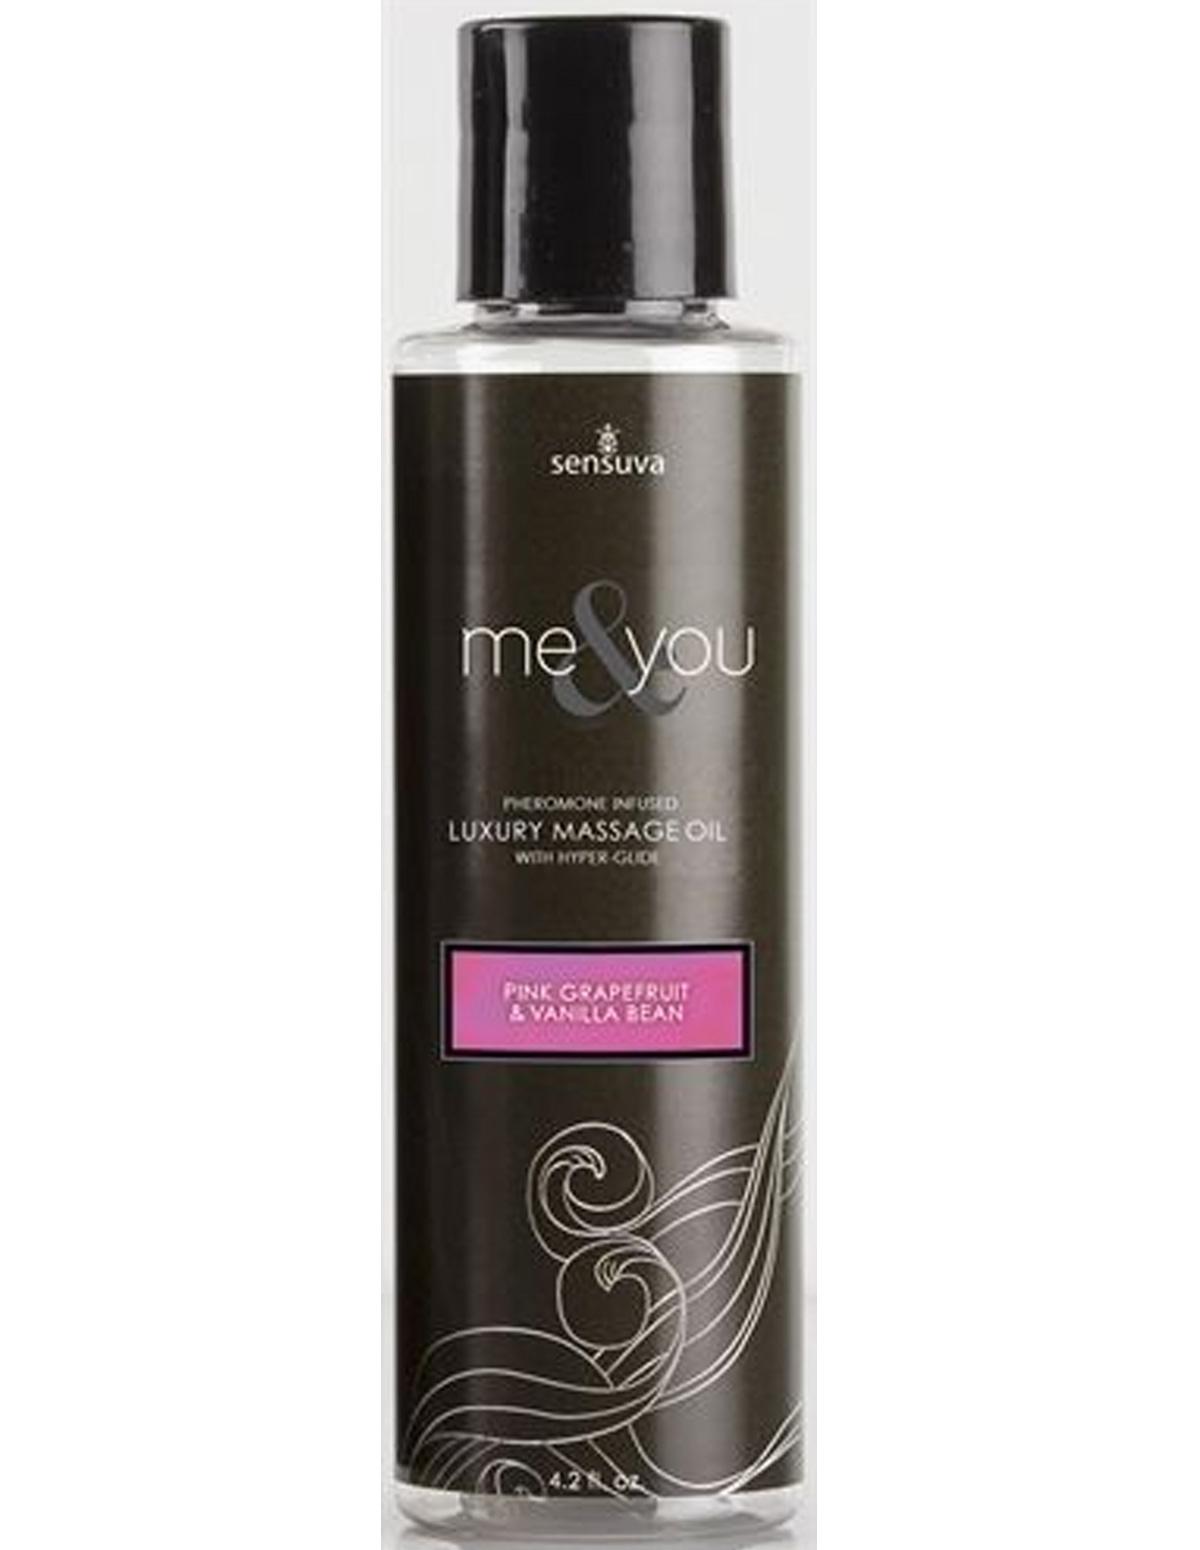 Me & You Massage Oil Grapefruit & Vanilla Bean